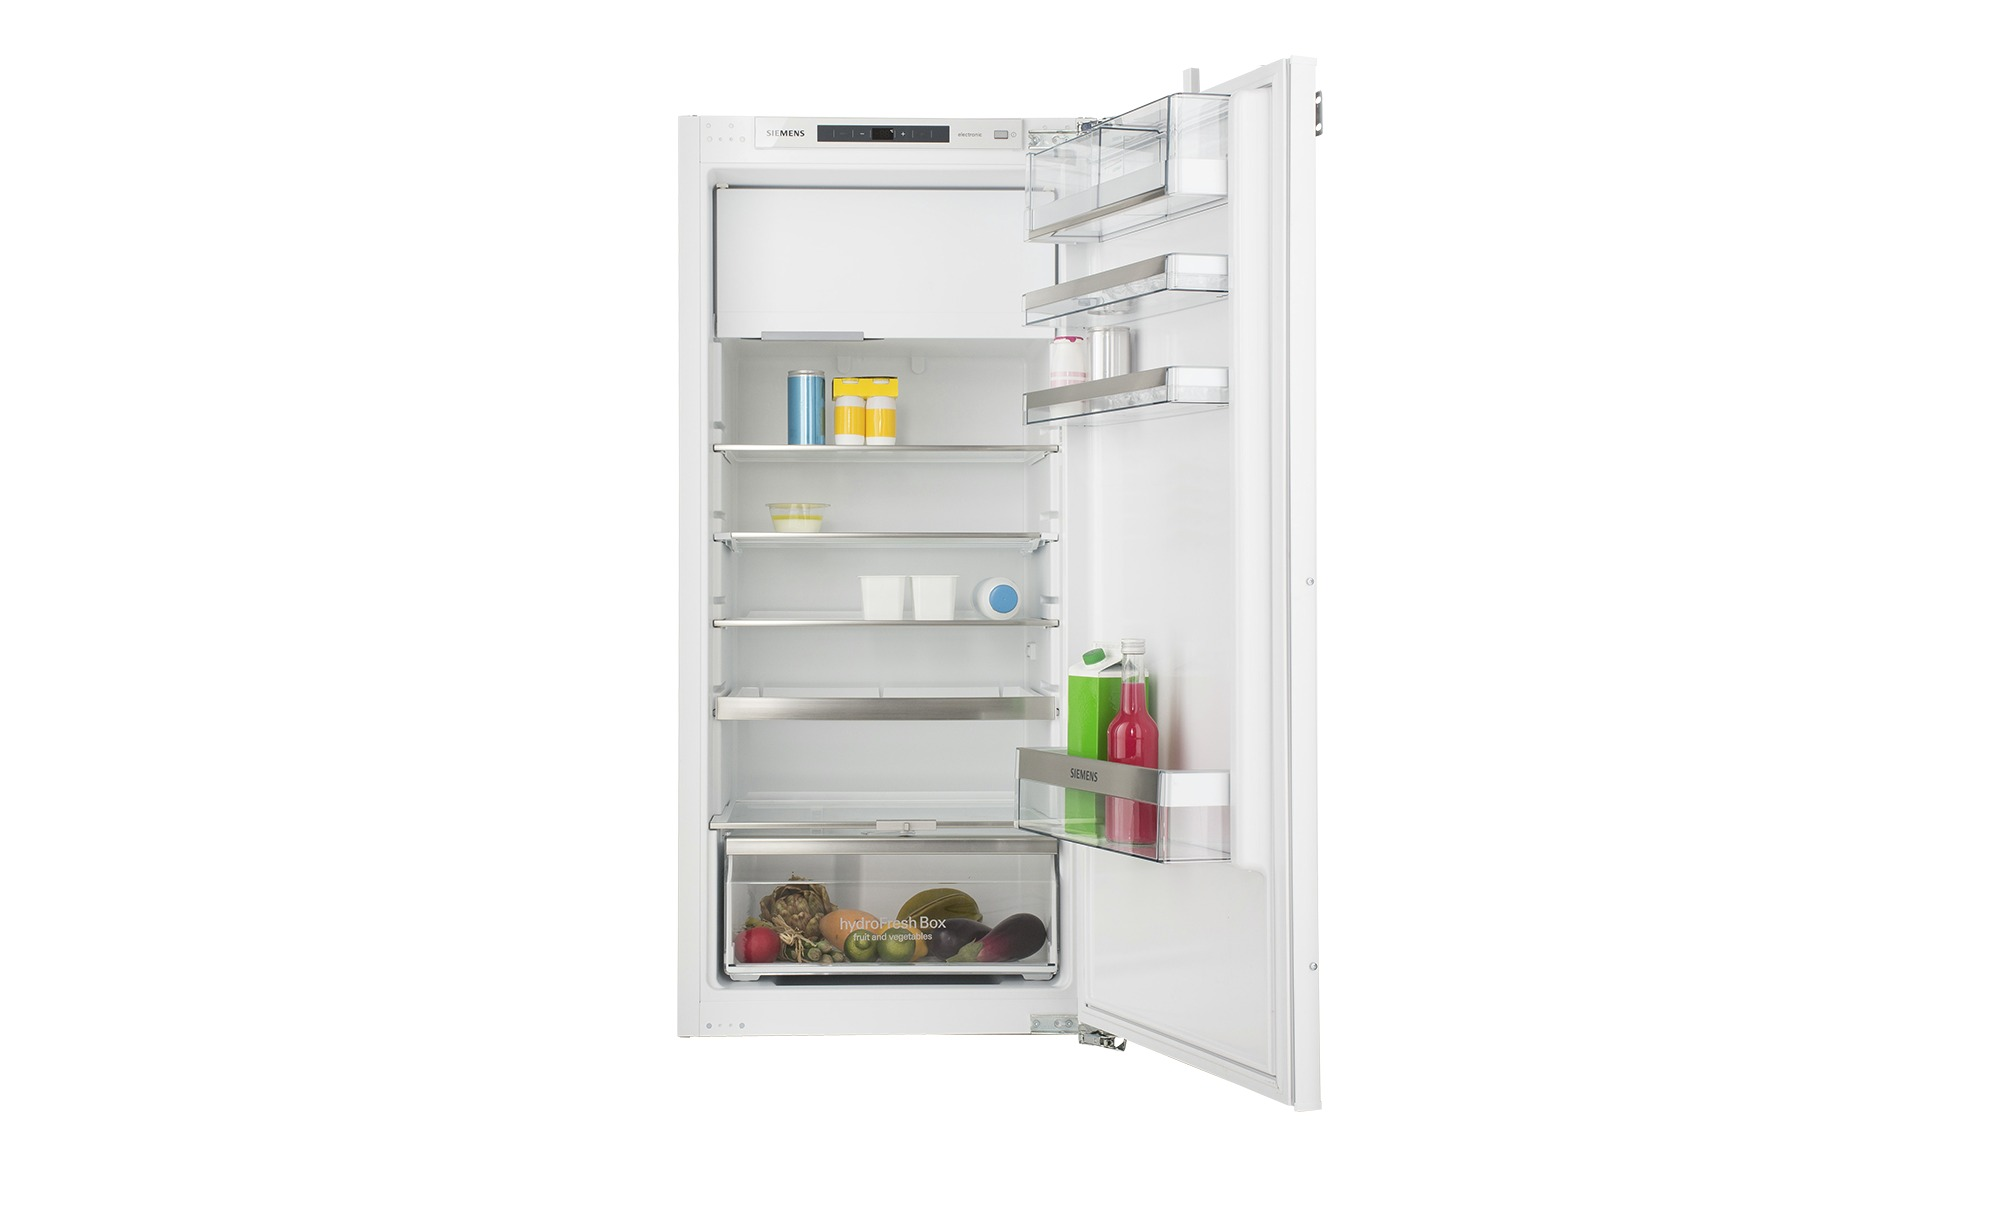 Siemens Unterbau Kühlschrank : Siemens einbau kühlschrank ki laf möbel höffner